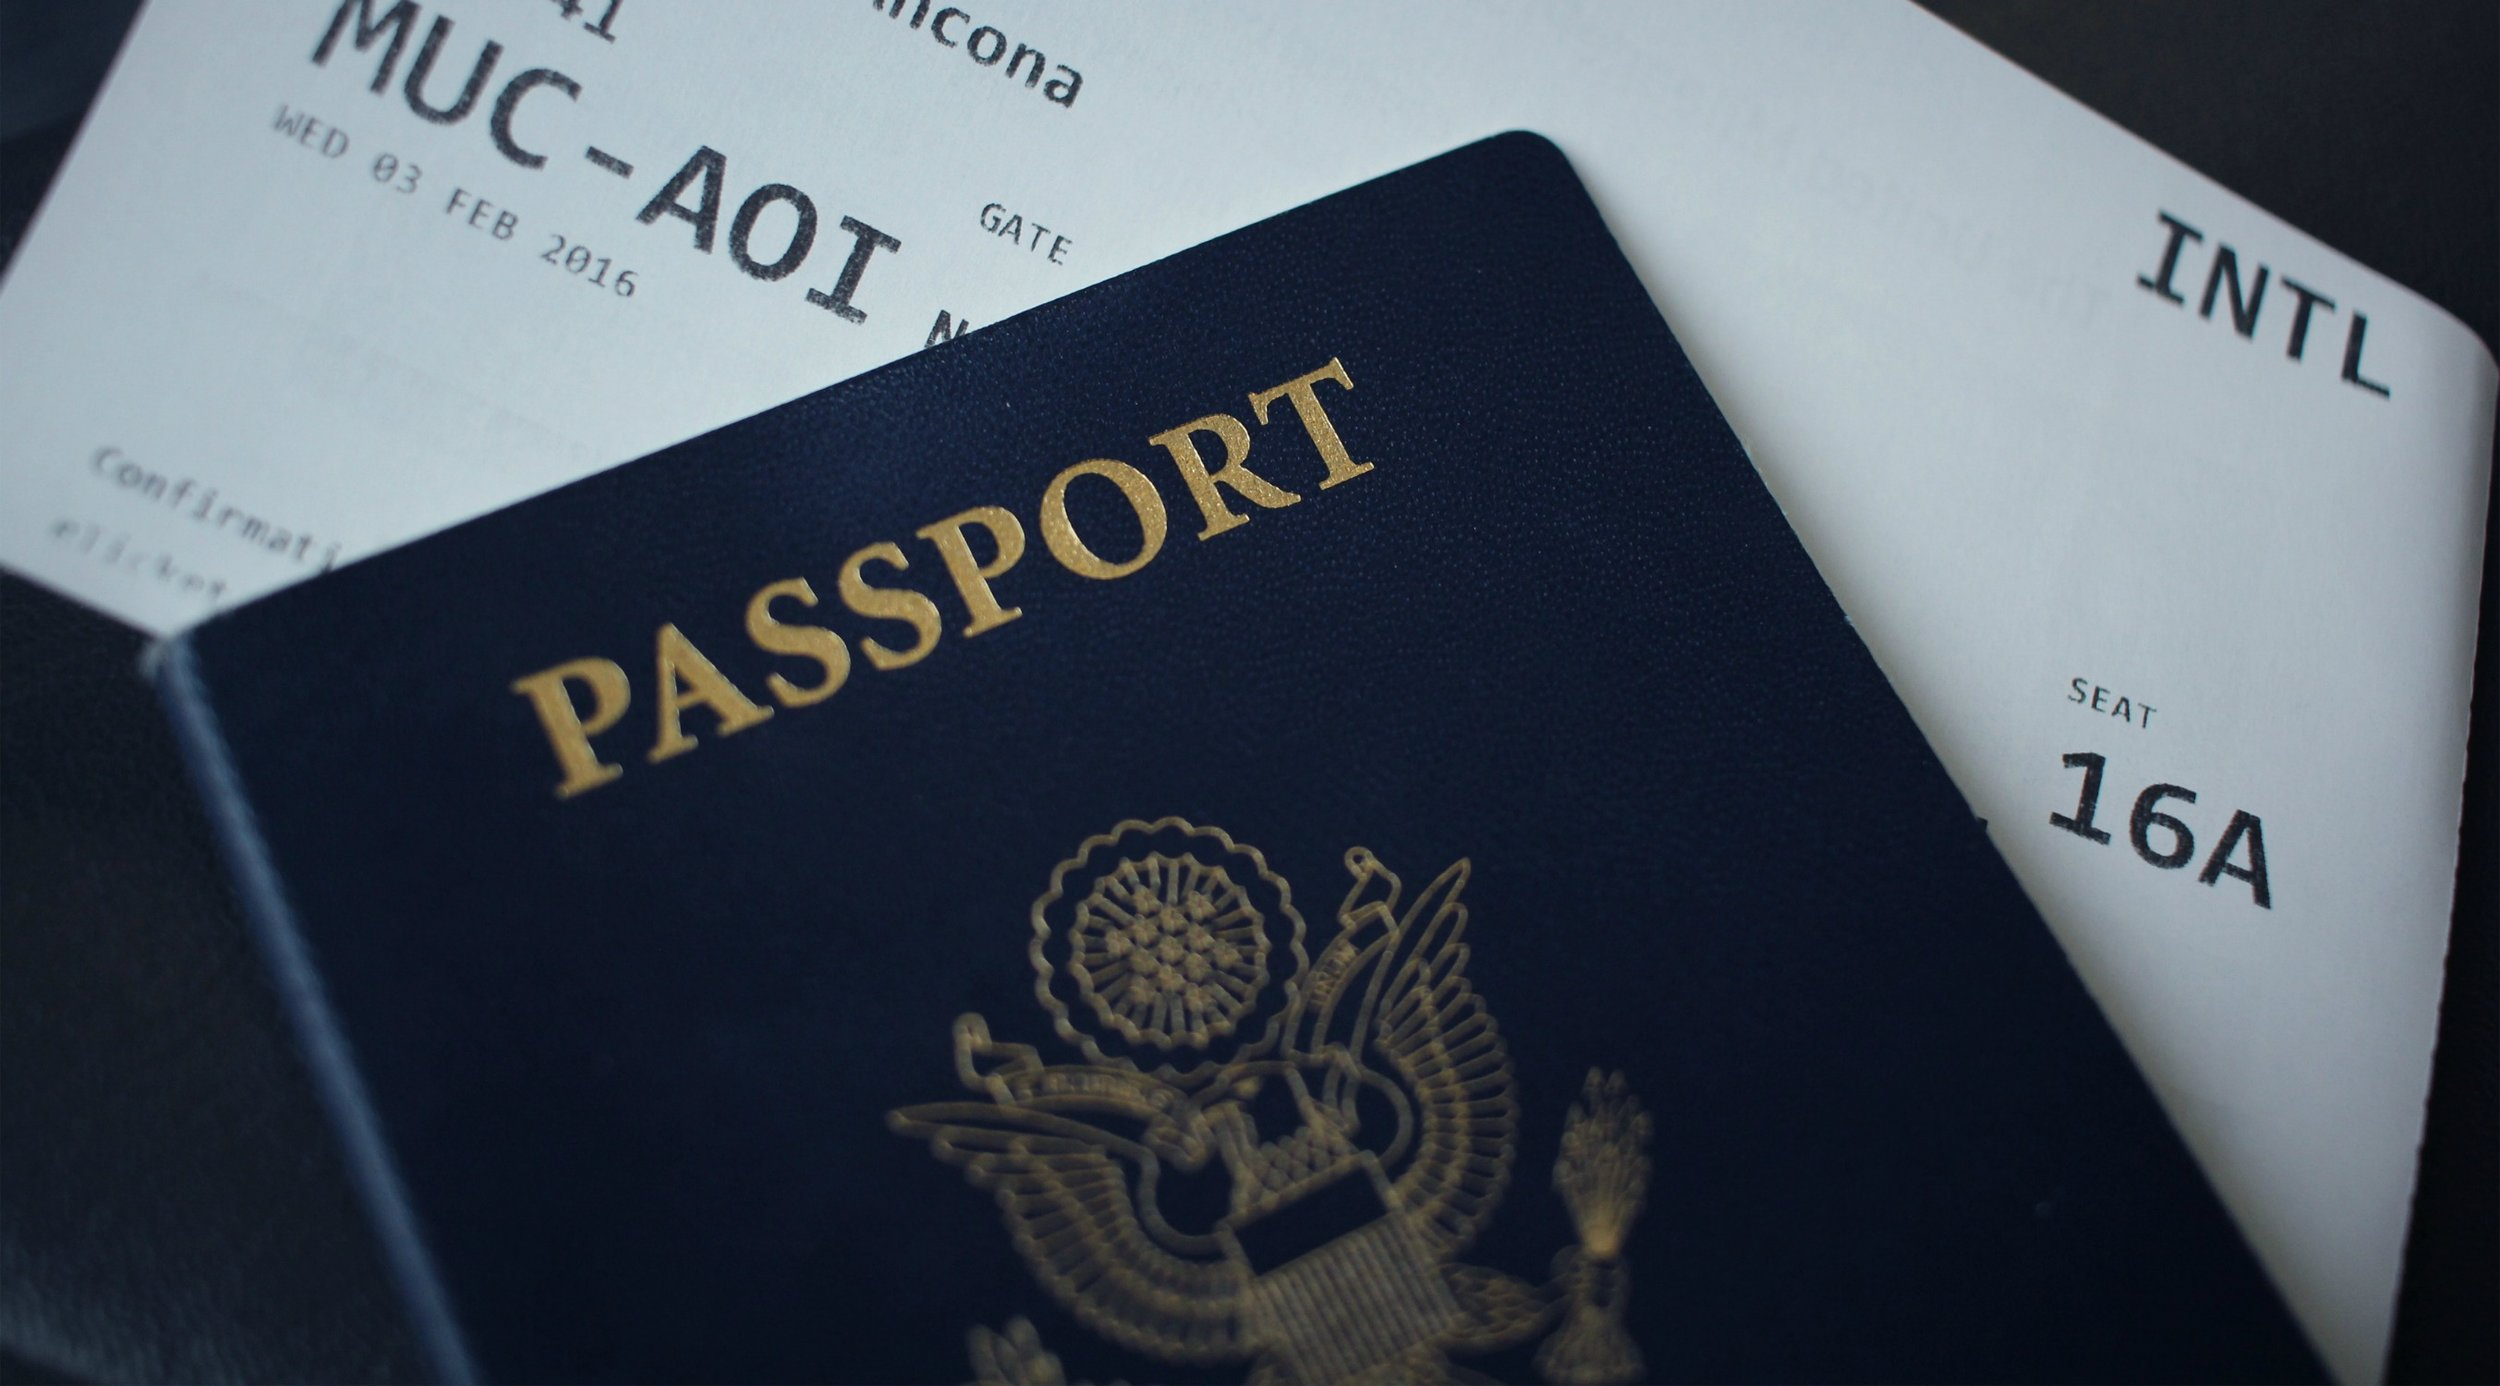 Copy of US Embassy Registration